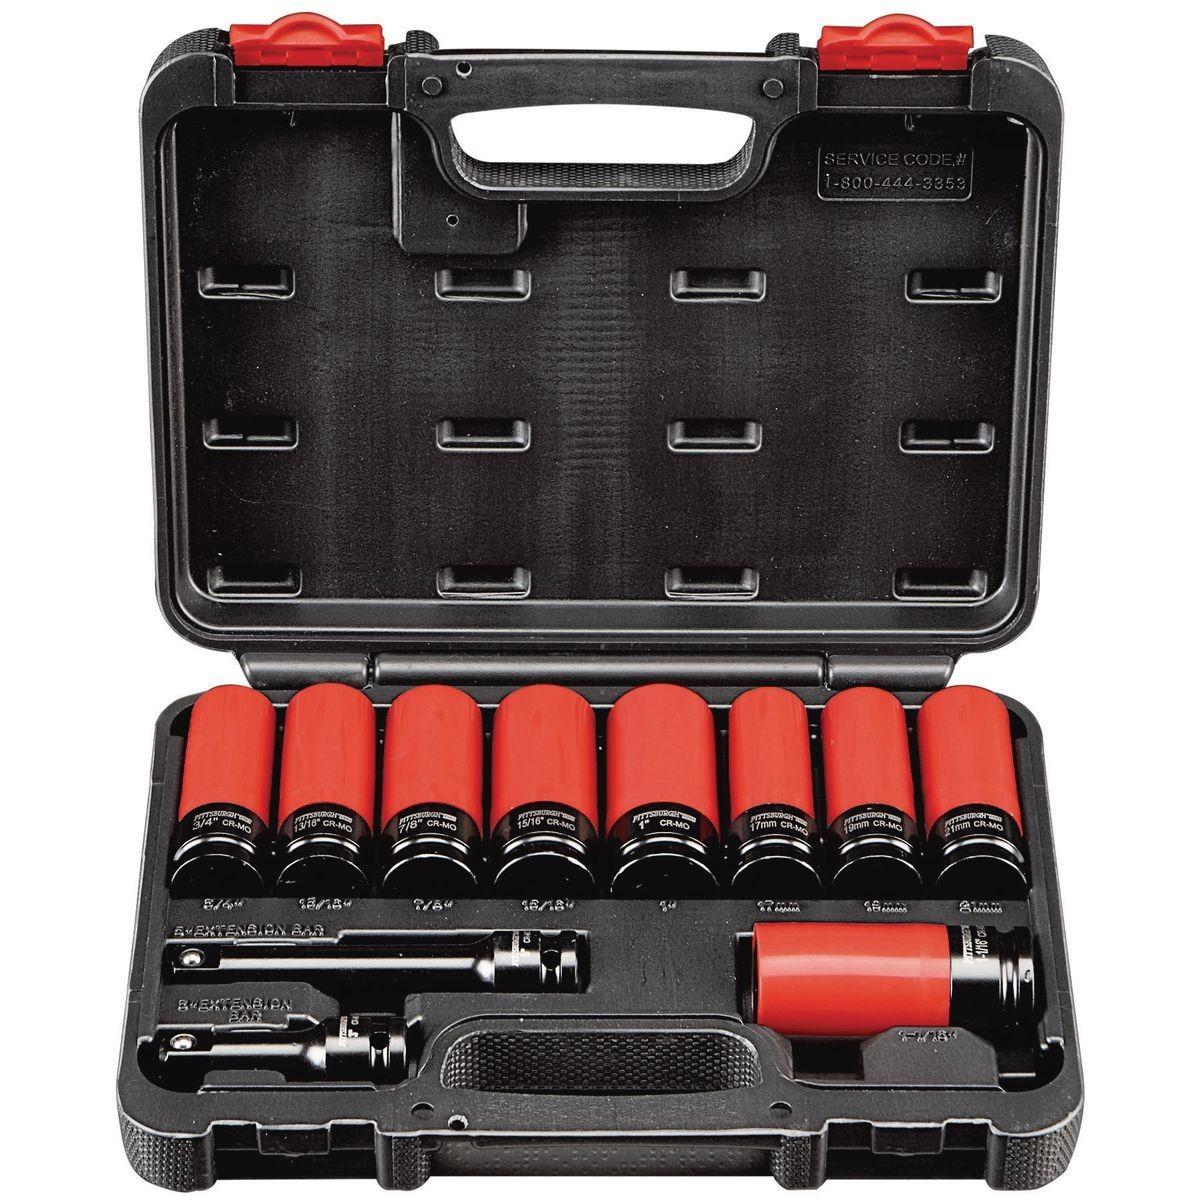 1 2 In Drive Super High Torque Lug Nut Impact Socket Set 11 Pc In 2020 Impact Socket Set Impact Sockets Socket Set